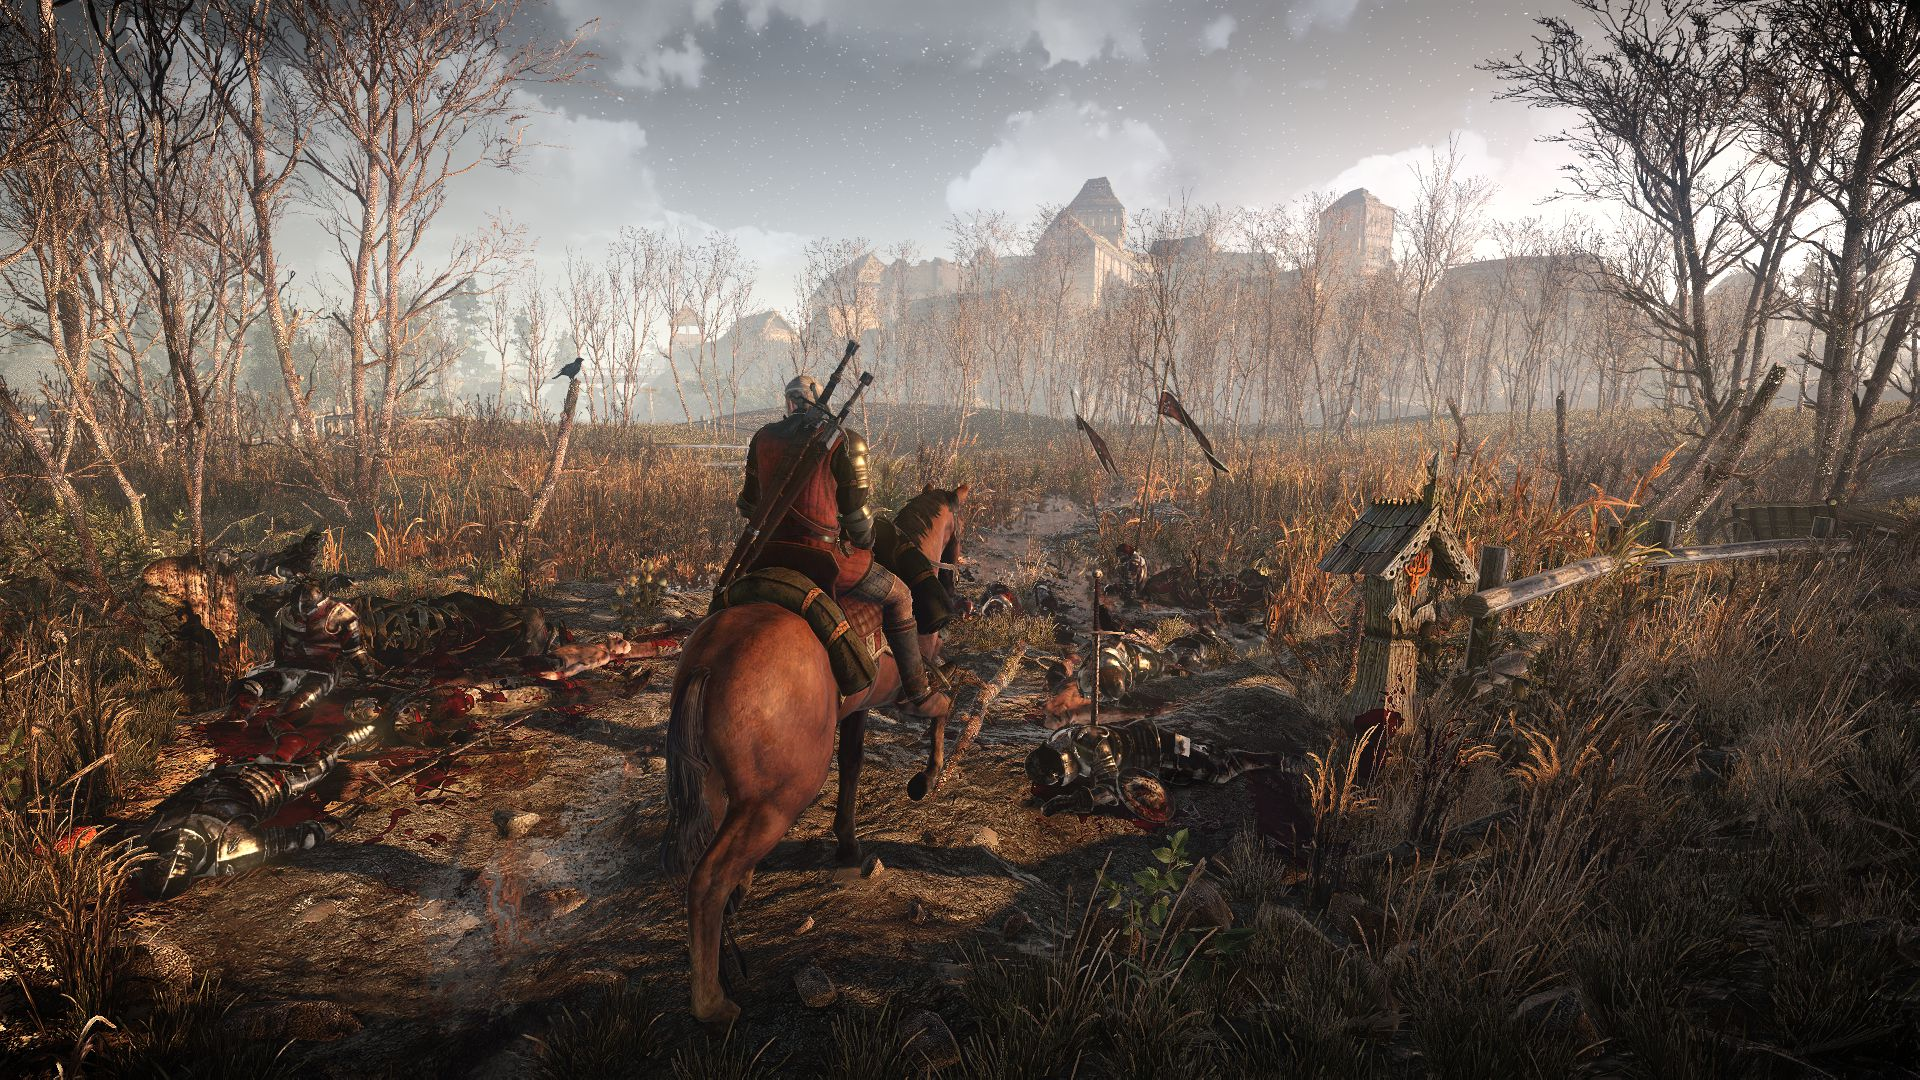 the_witcher_3_wild_hunt__geralt_travels_through_war_ravaged_territory_1402422223